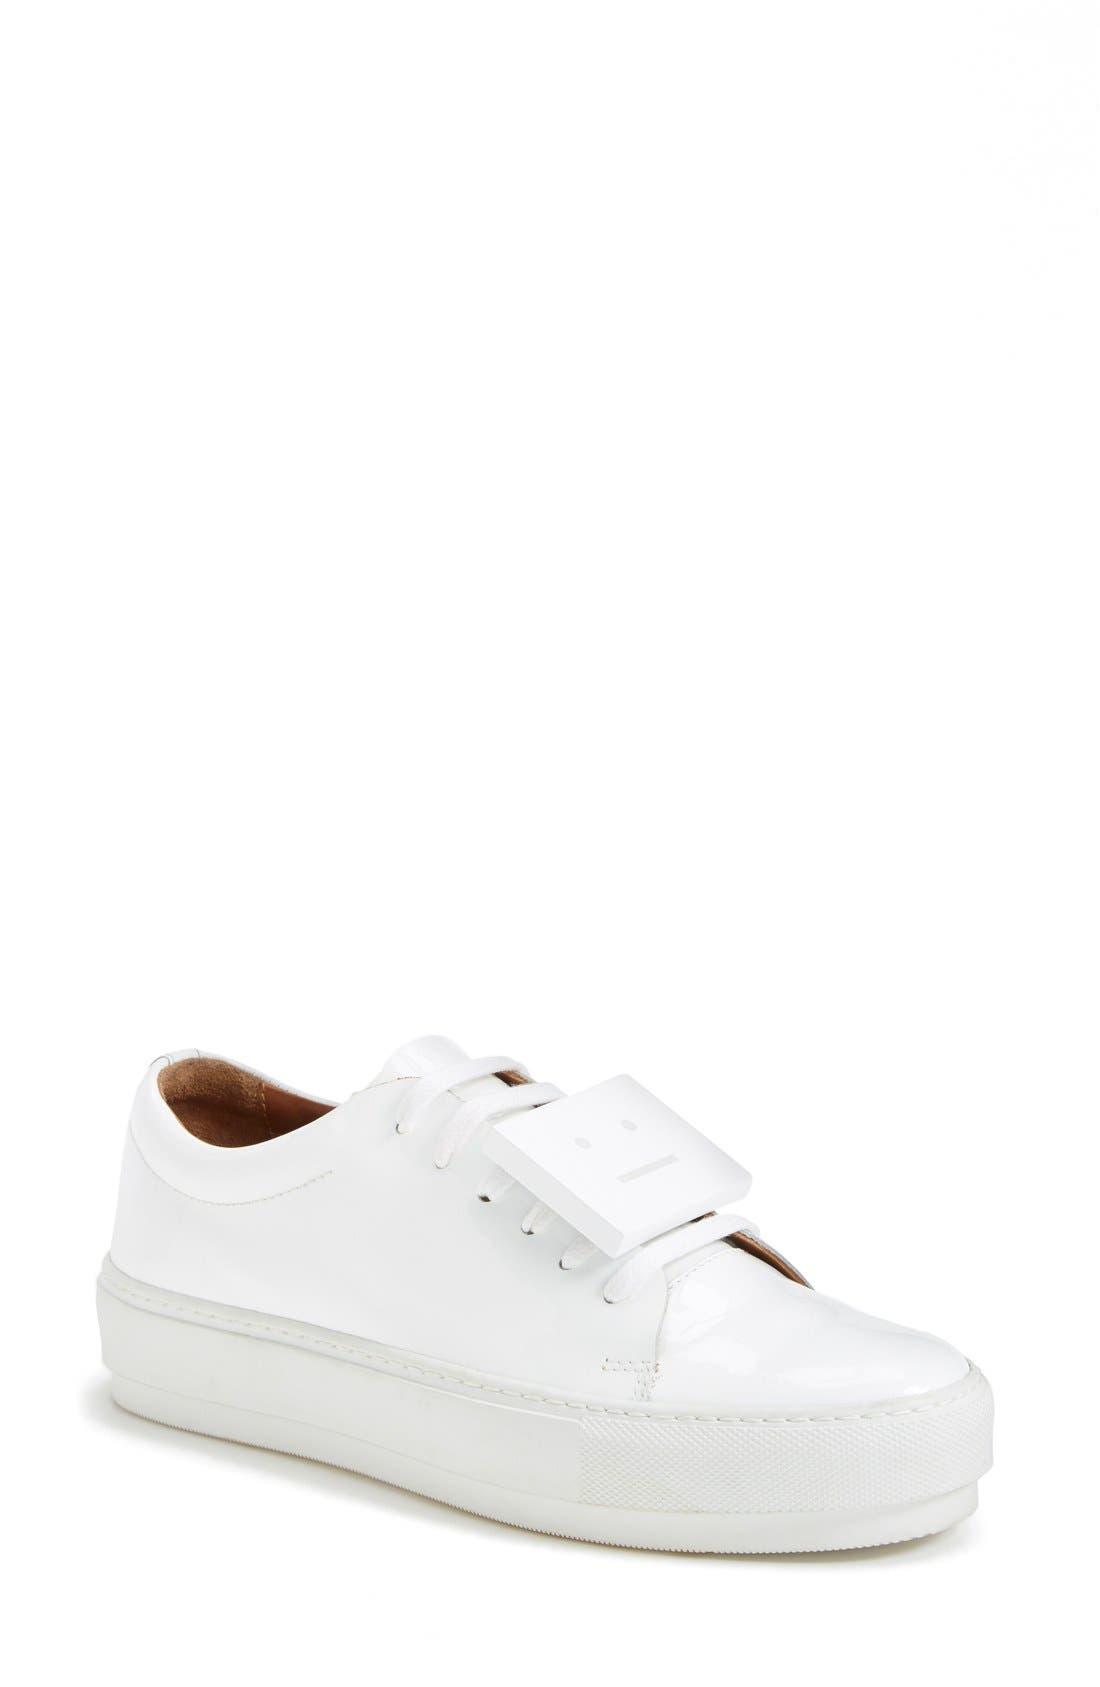 ACNE STUDIOS 'Adriana' Leather Sneaker